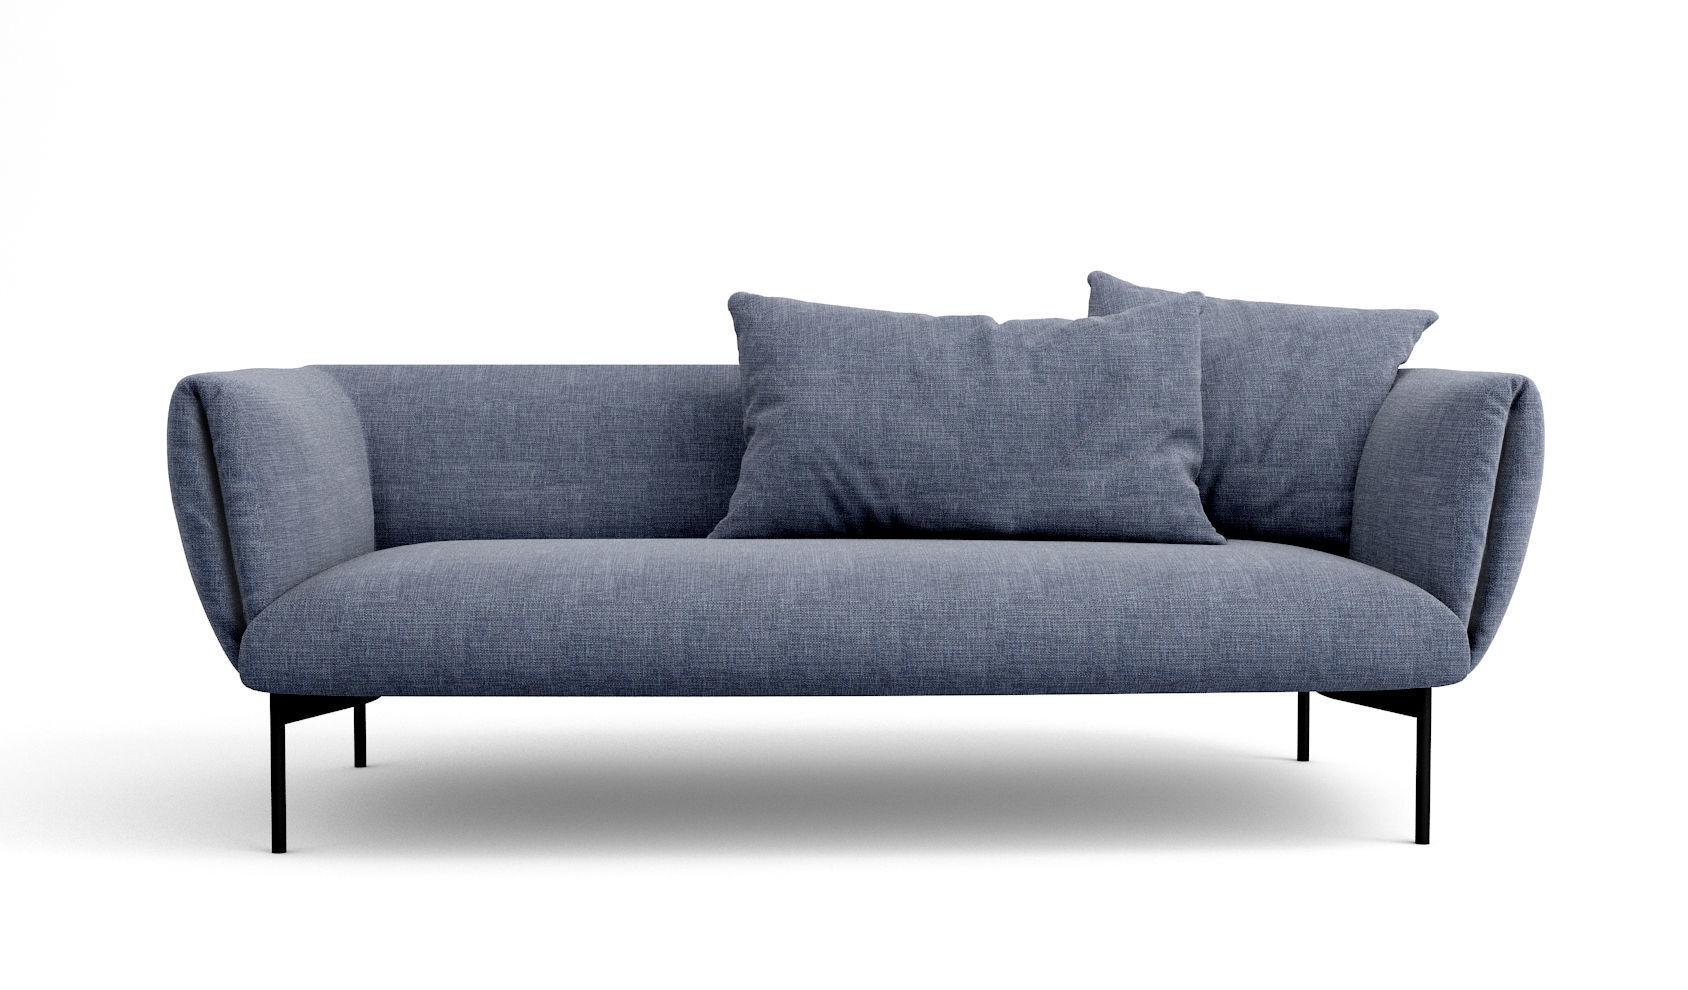 Impressionen Sofa Loungemobel Fed Sofas Gunstig Bettkasten Stretch